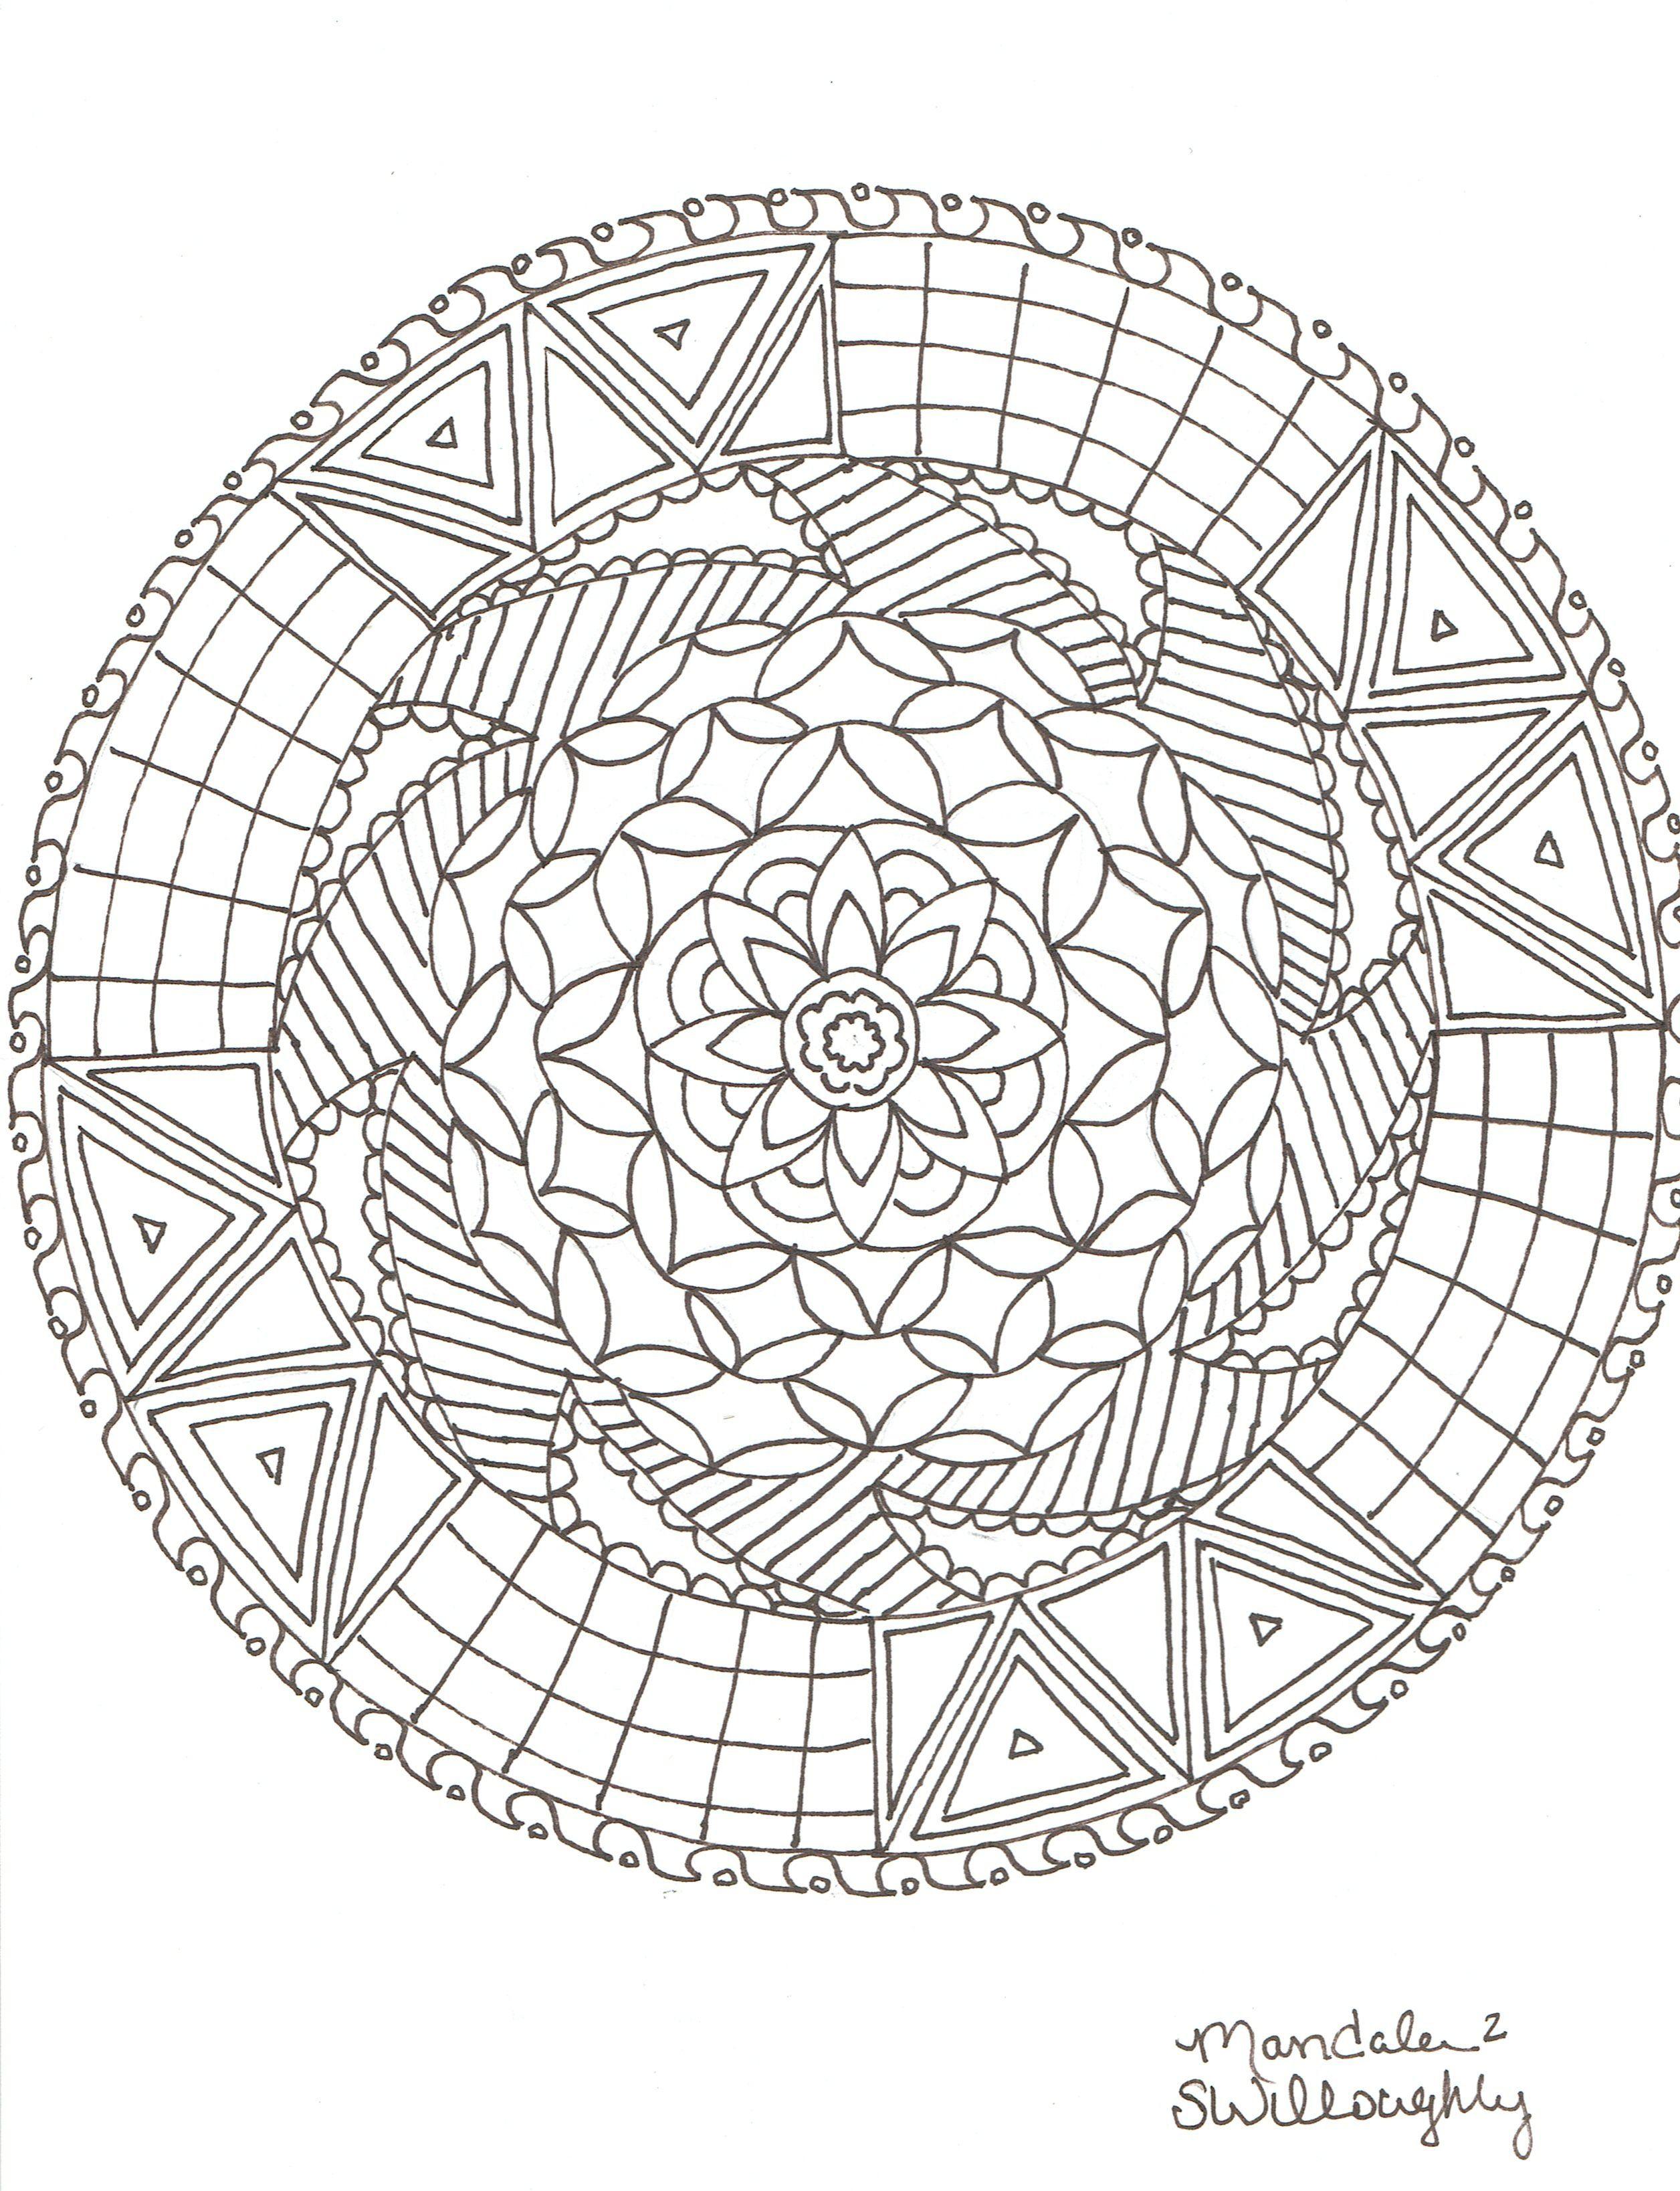 Mandala Coloring Page By Sw   Mandalas   Mandala Coloring